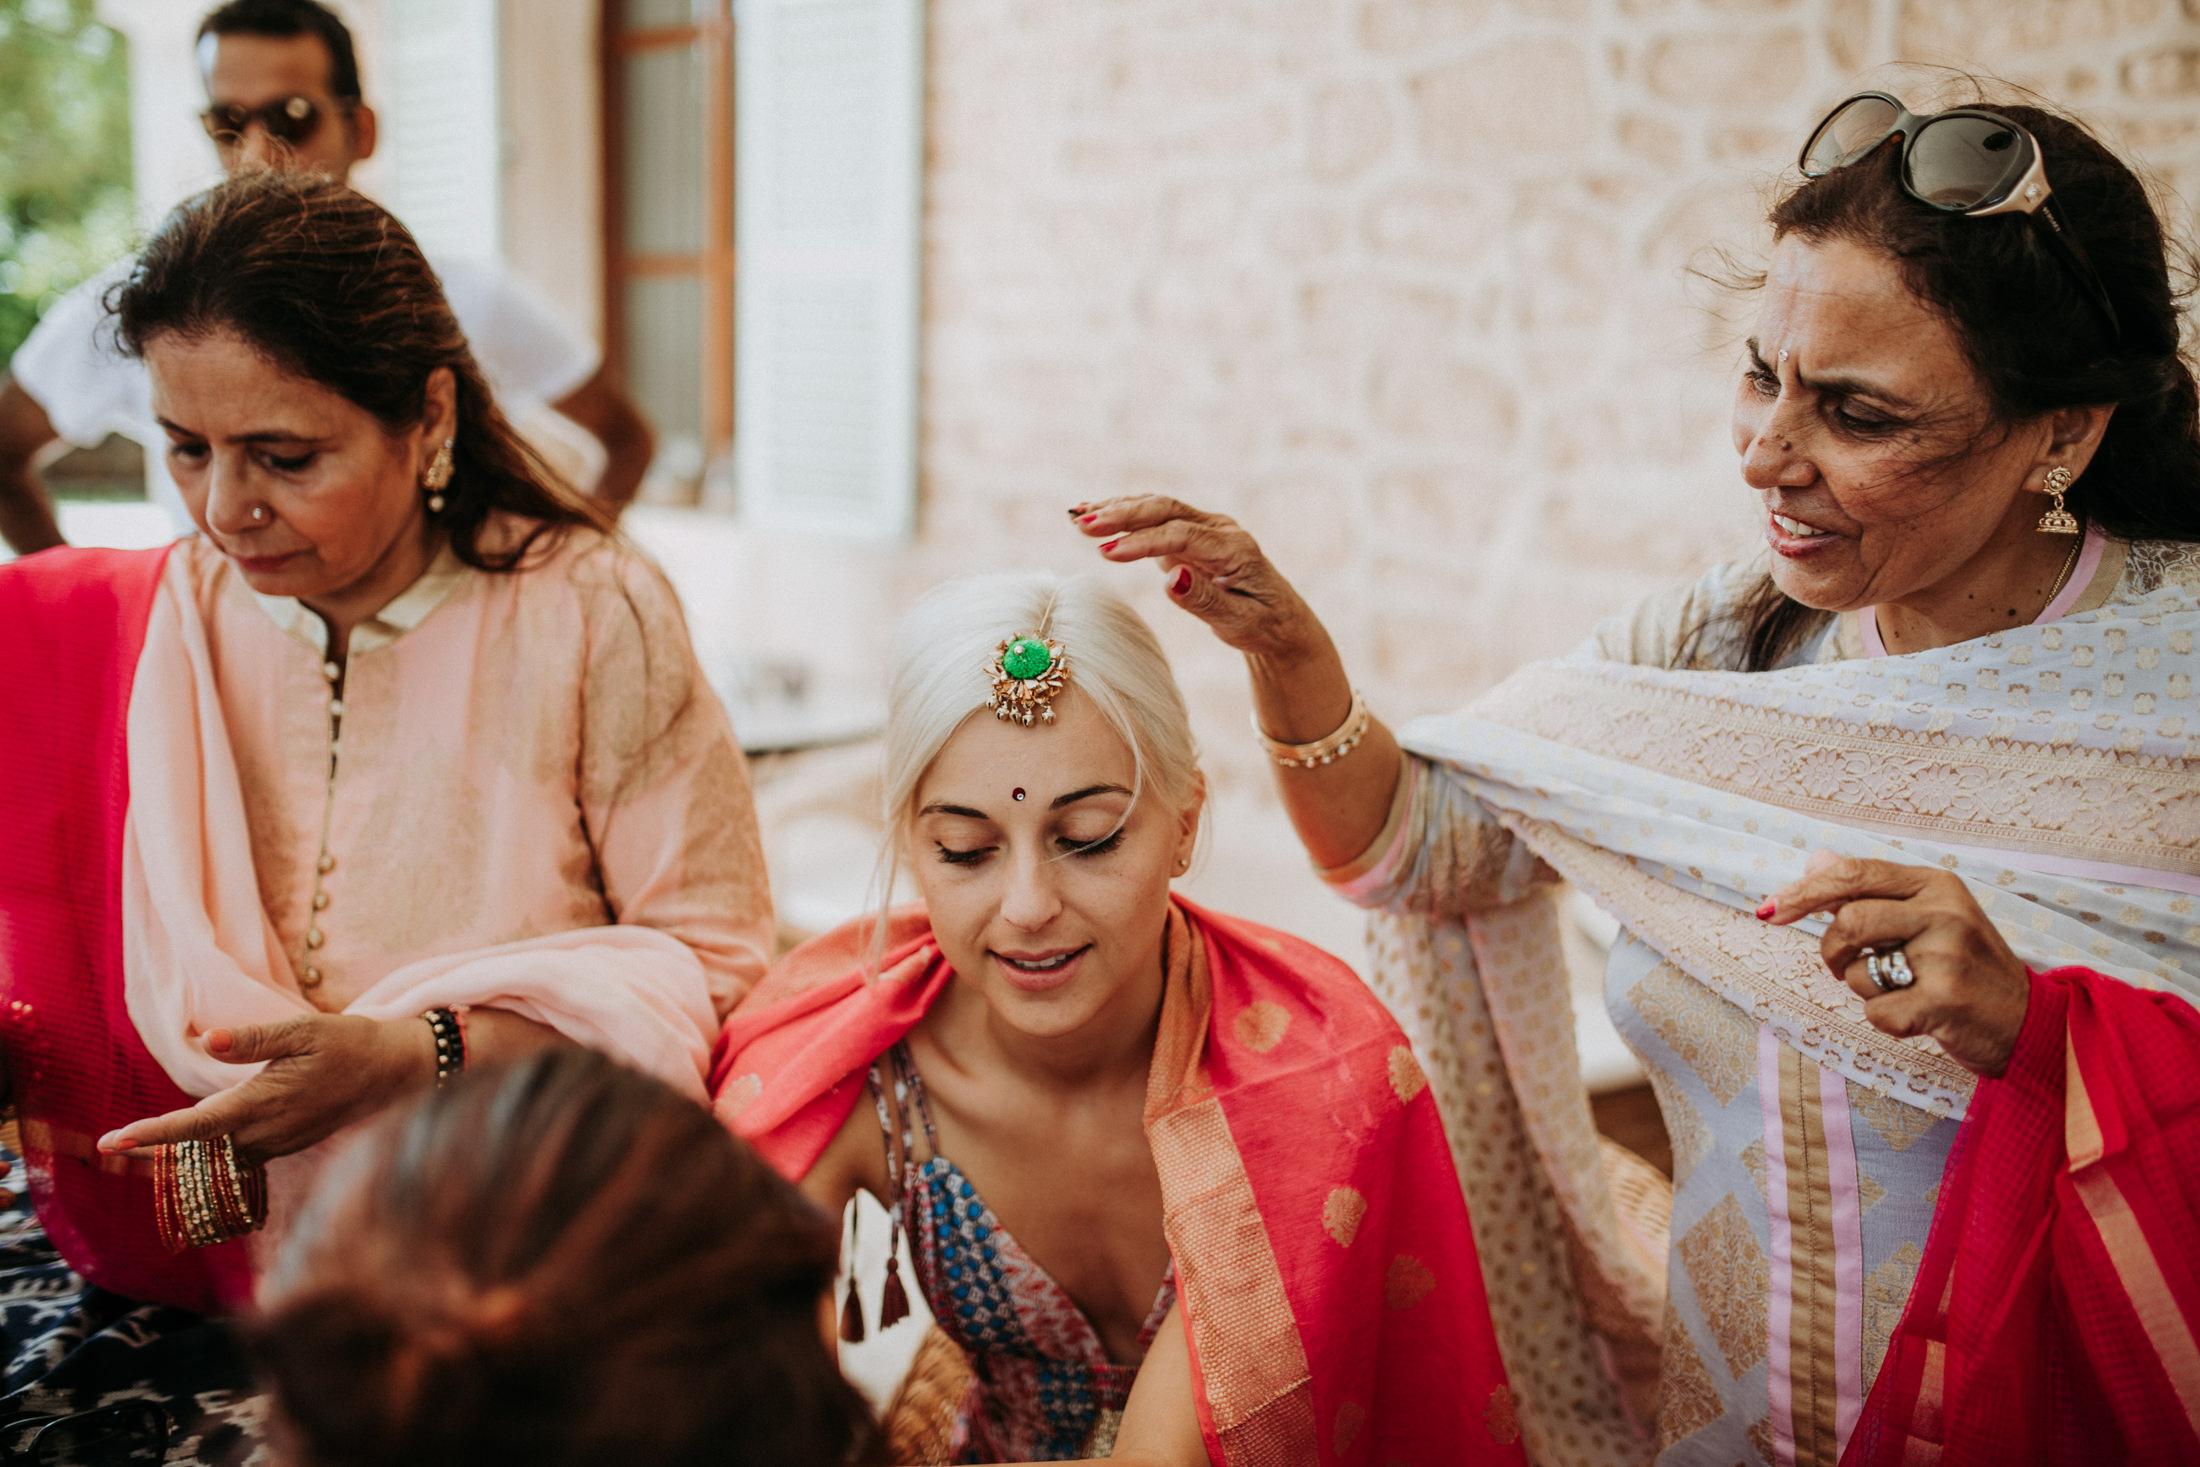 Wedding_Photographer_Mallorca_Daniela-Marquardt_Photography_New_York_Iceland_Tuscany_Santorini_Portugal_Austria_Bavaria_Elopement_Hochzeitsfotograf_AntjeRajat1_17